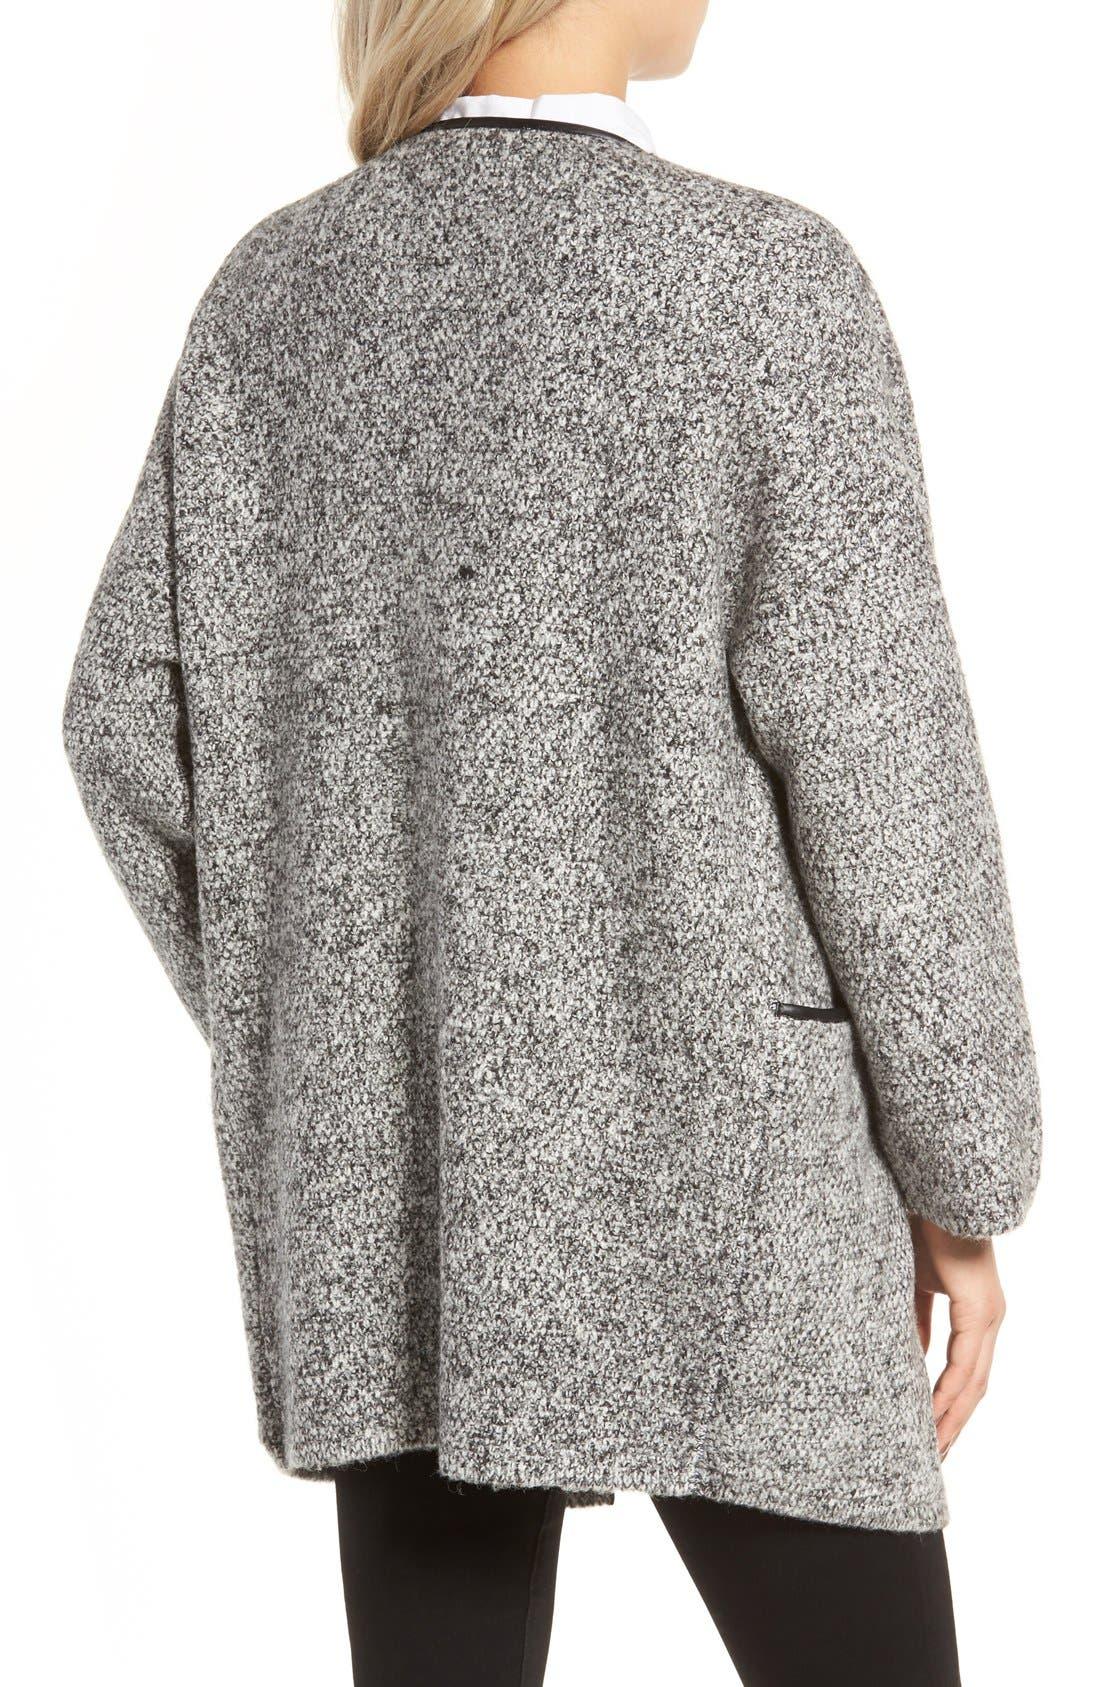 ASTR THE LABEL,                             ASTR Drape Front Sweater Jacket,                             Alternate thumbnail 5, color,                             001